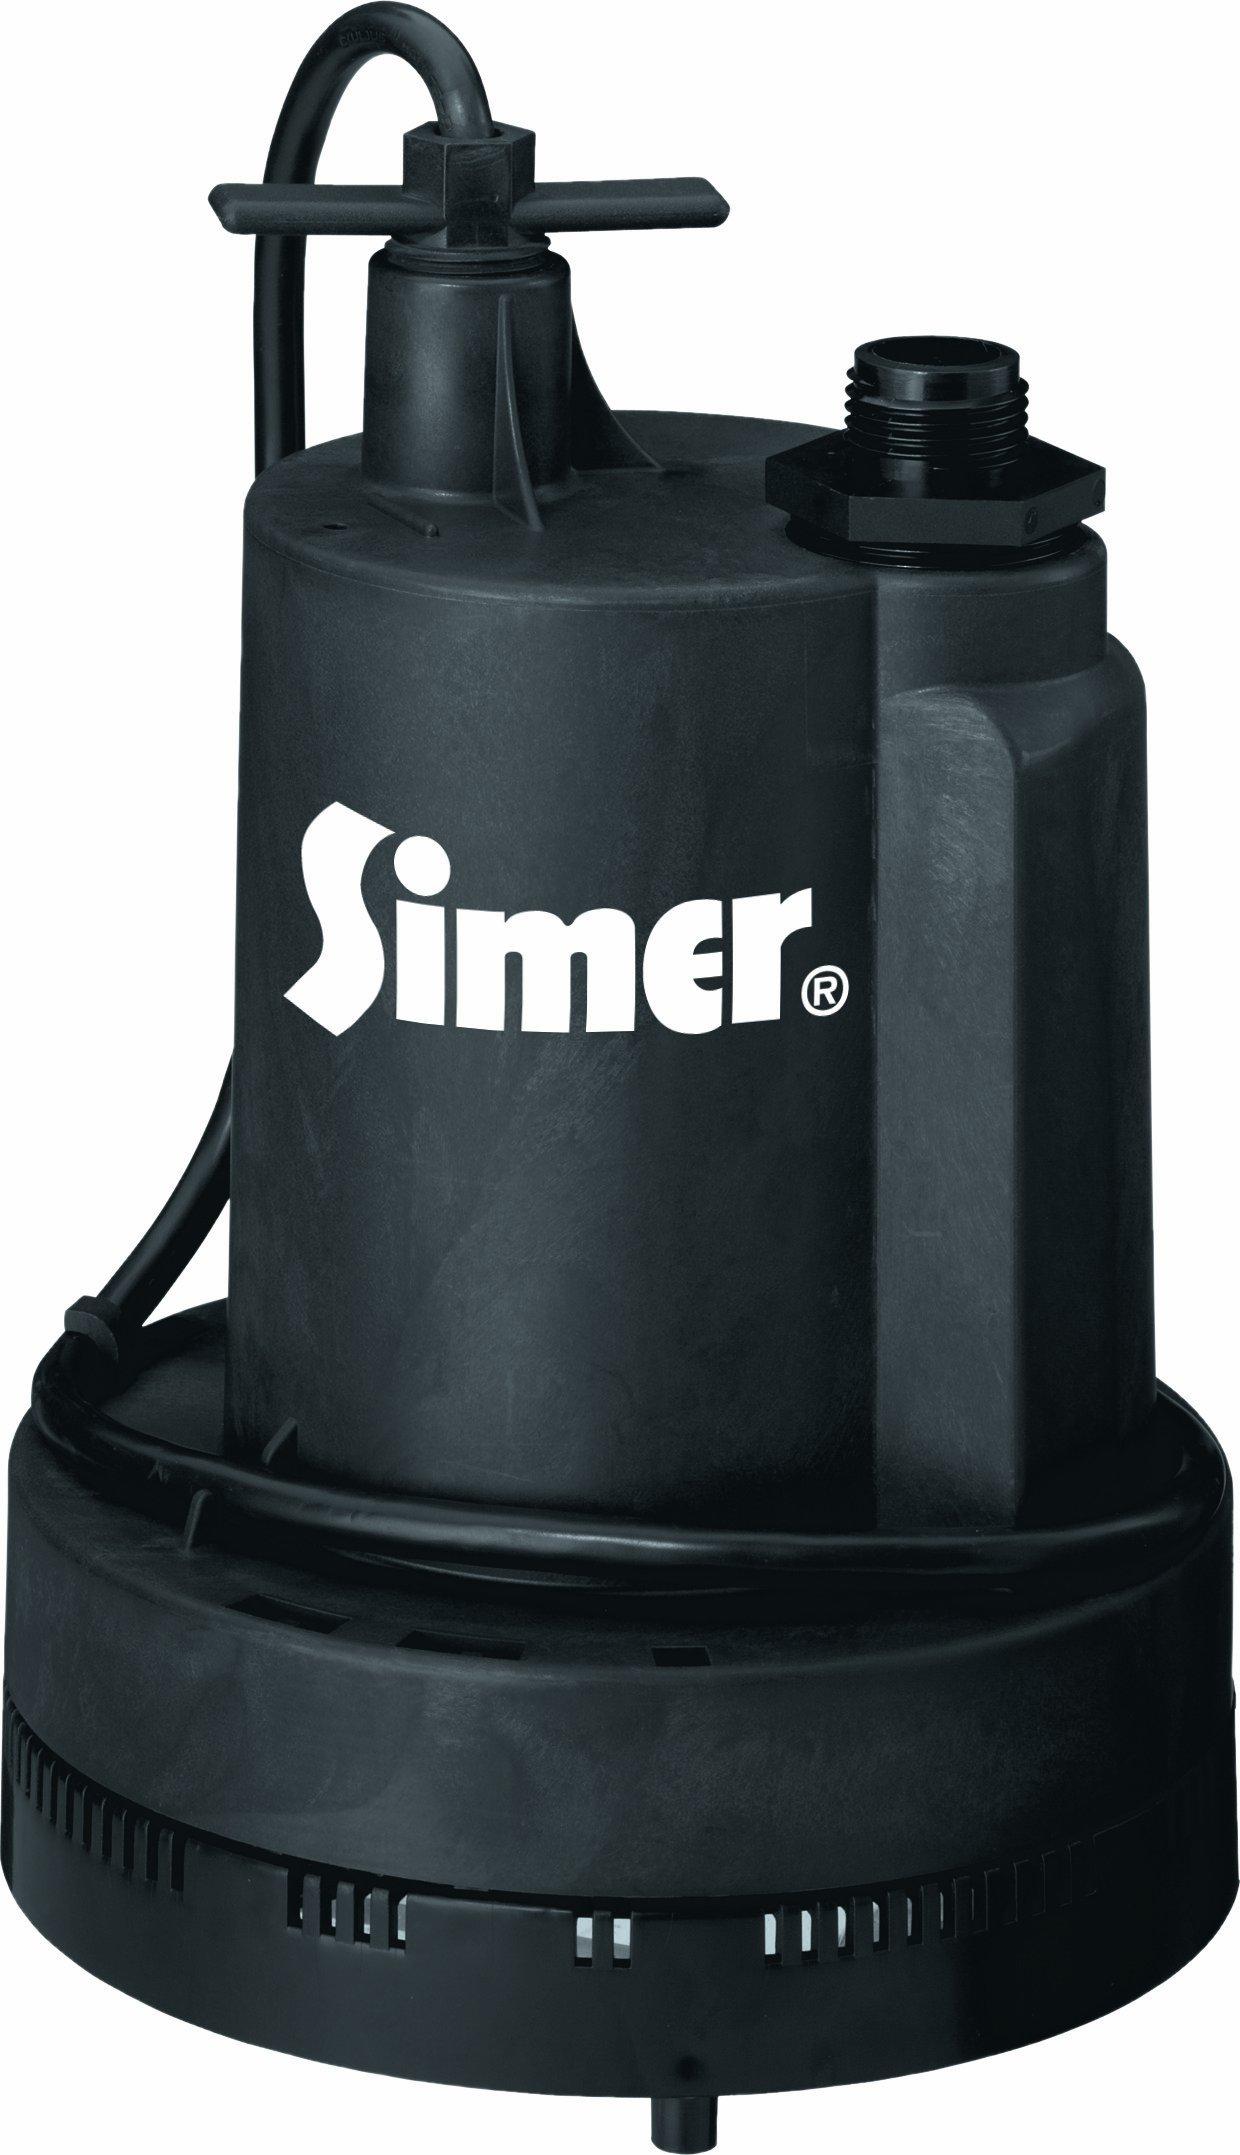 Simer 2305-04 Geyser II 1/4 HP Submersible Utility Pump by Simer